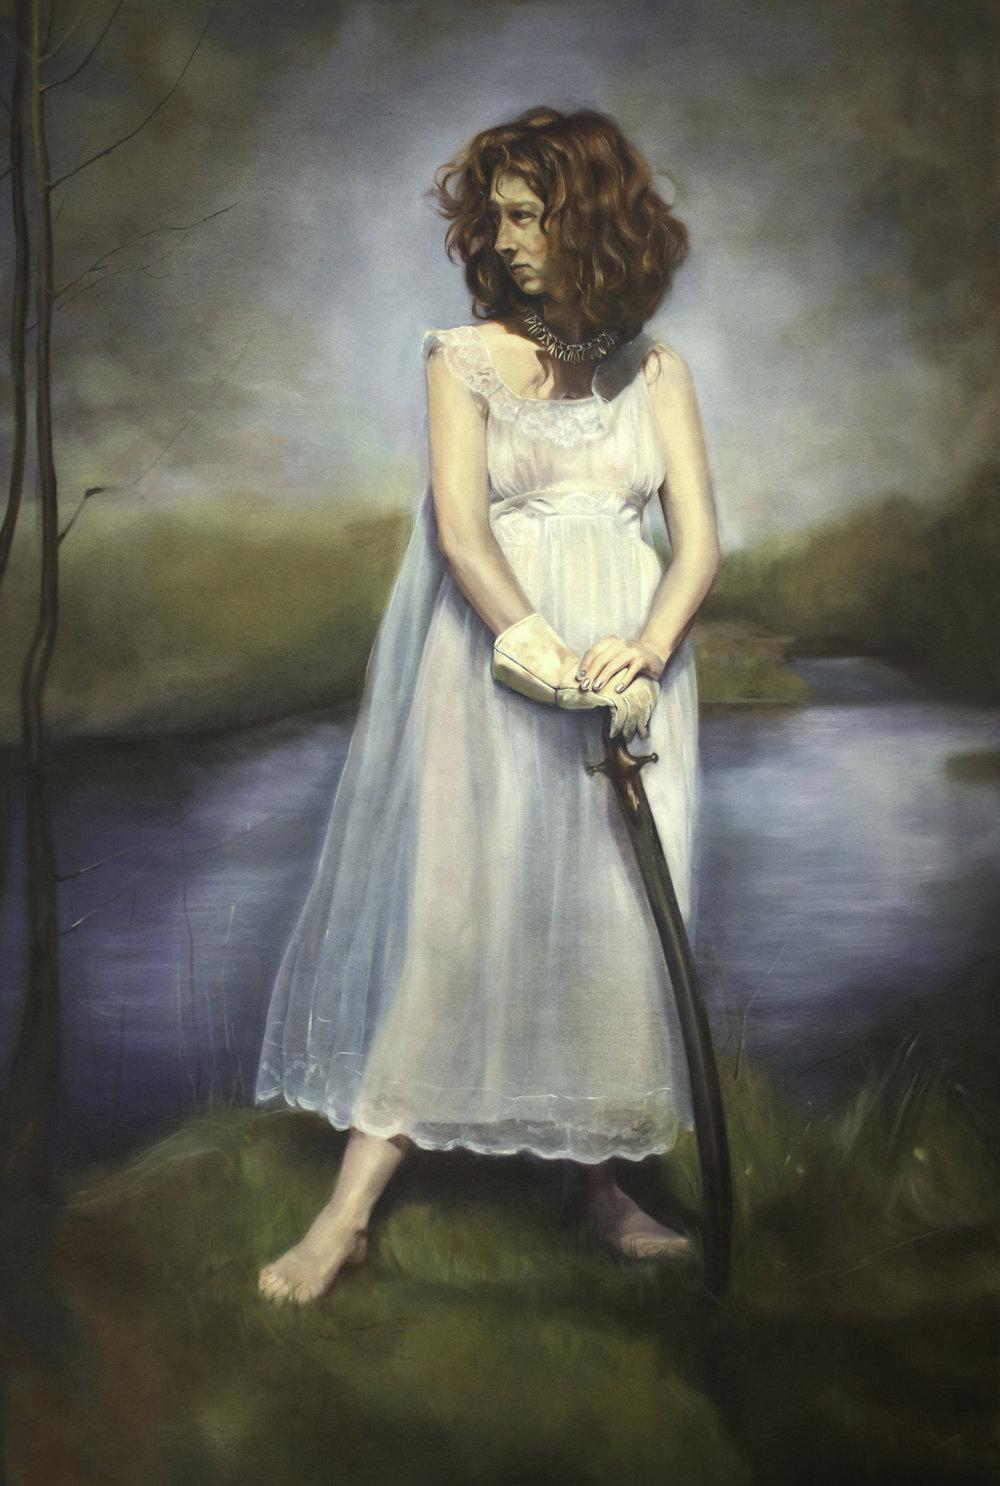 2016 - 'Highland Priestess'